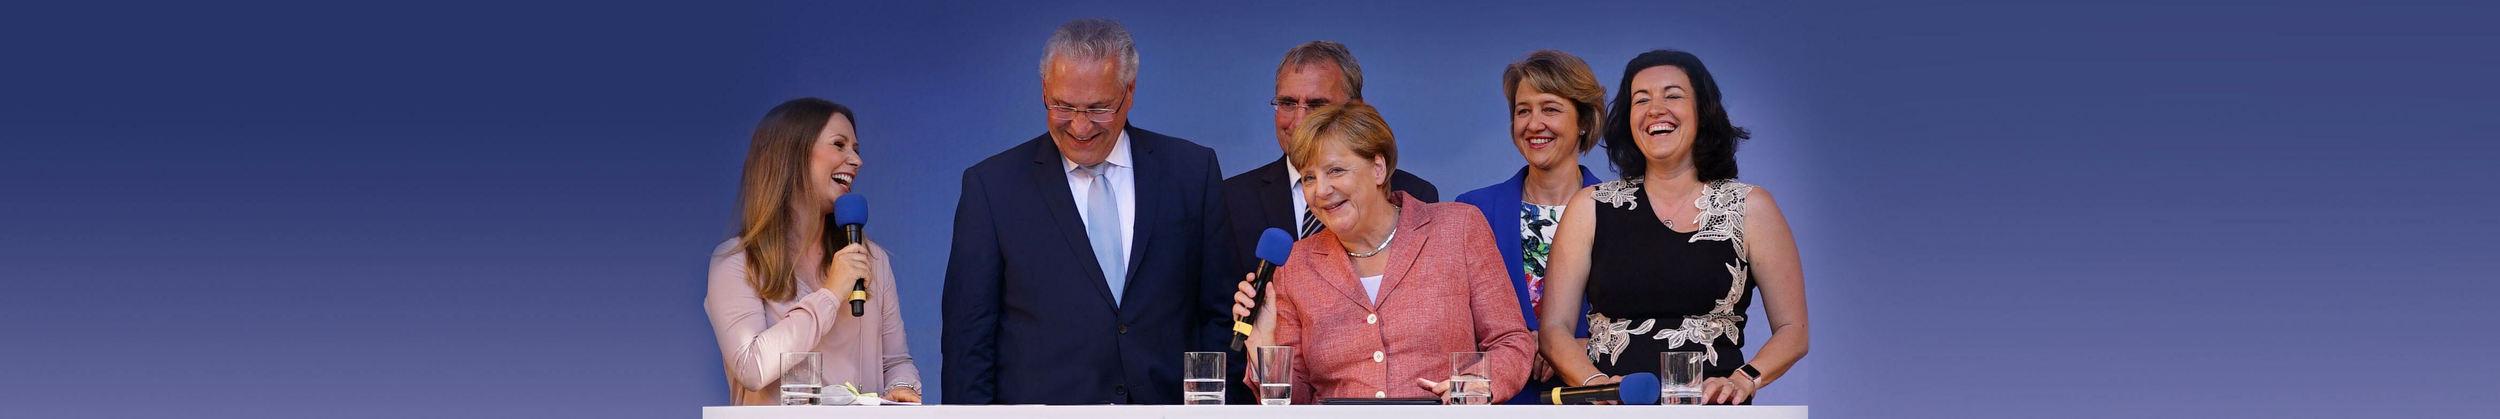 Eventmoderatorin Saskia Naumann mit Angela Merkel